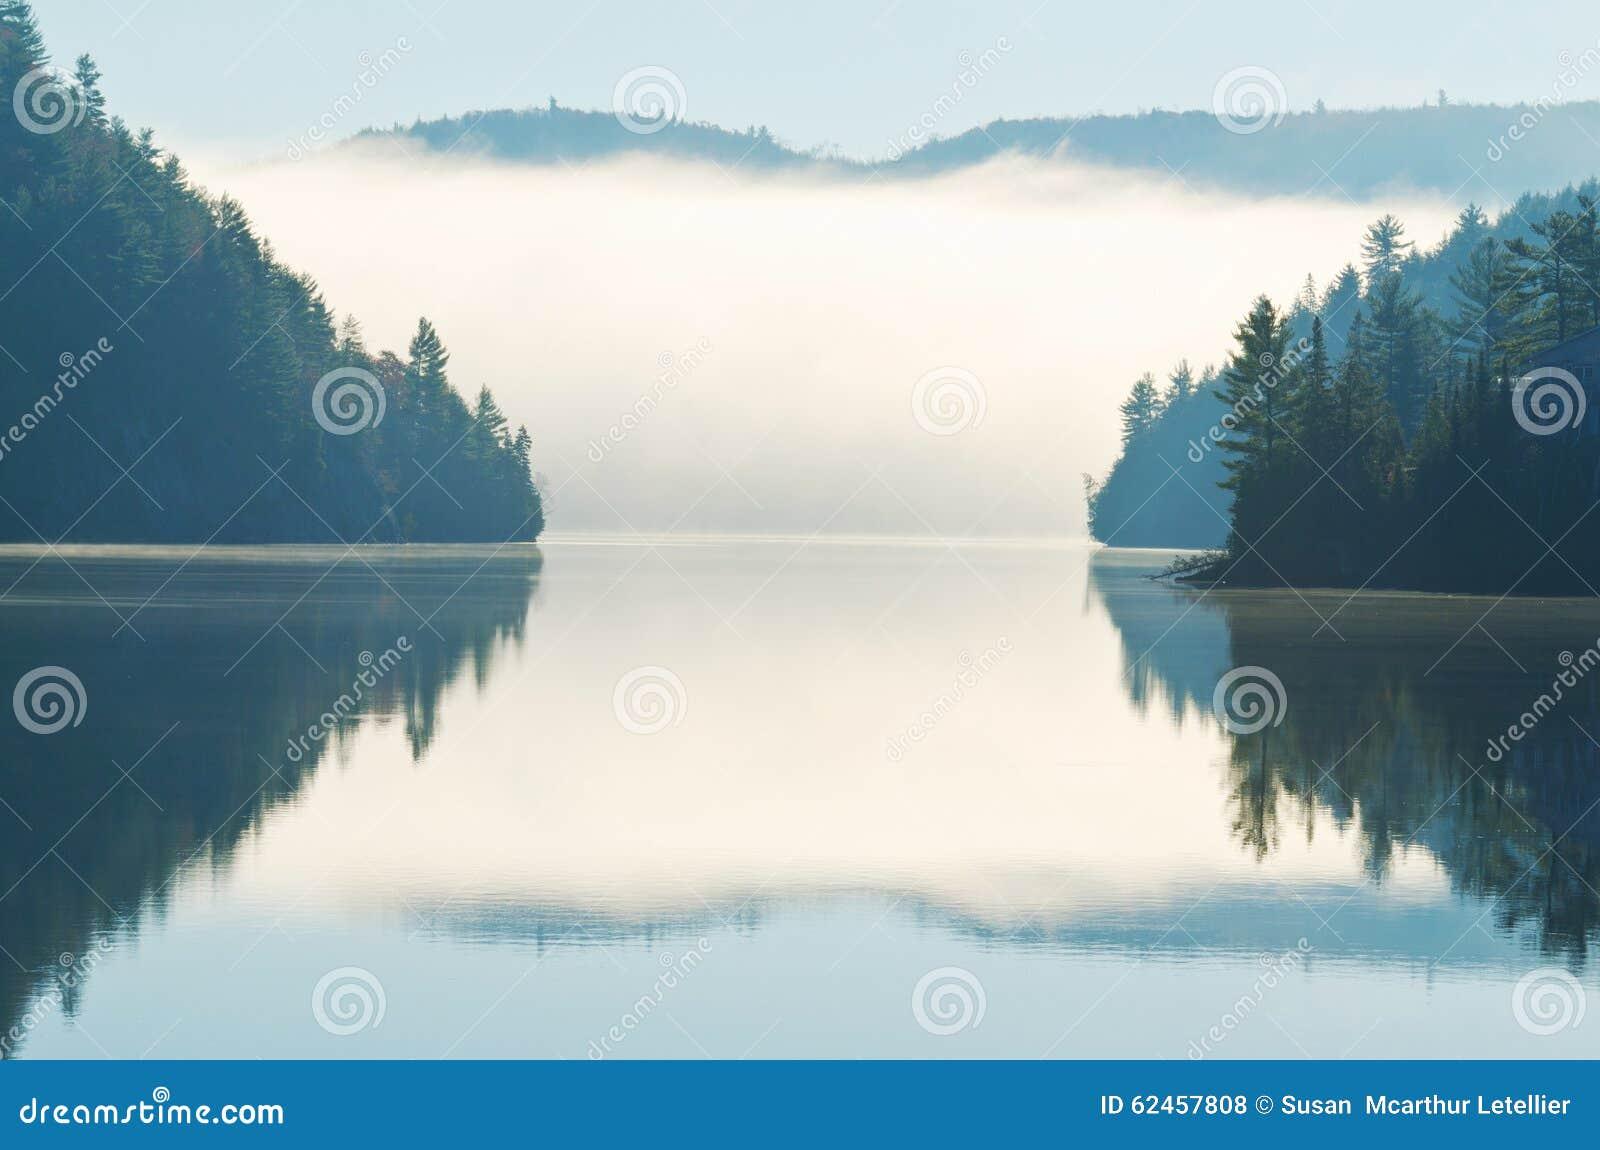 Reflection of Morning Fog Rising on Lake